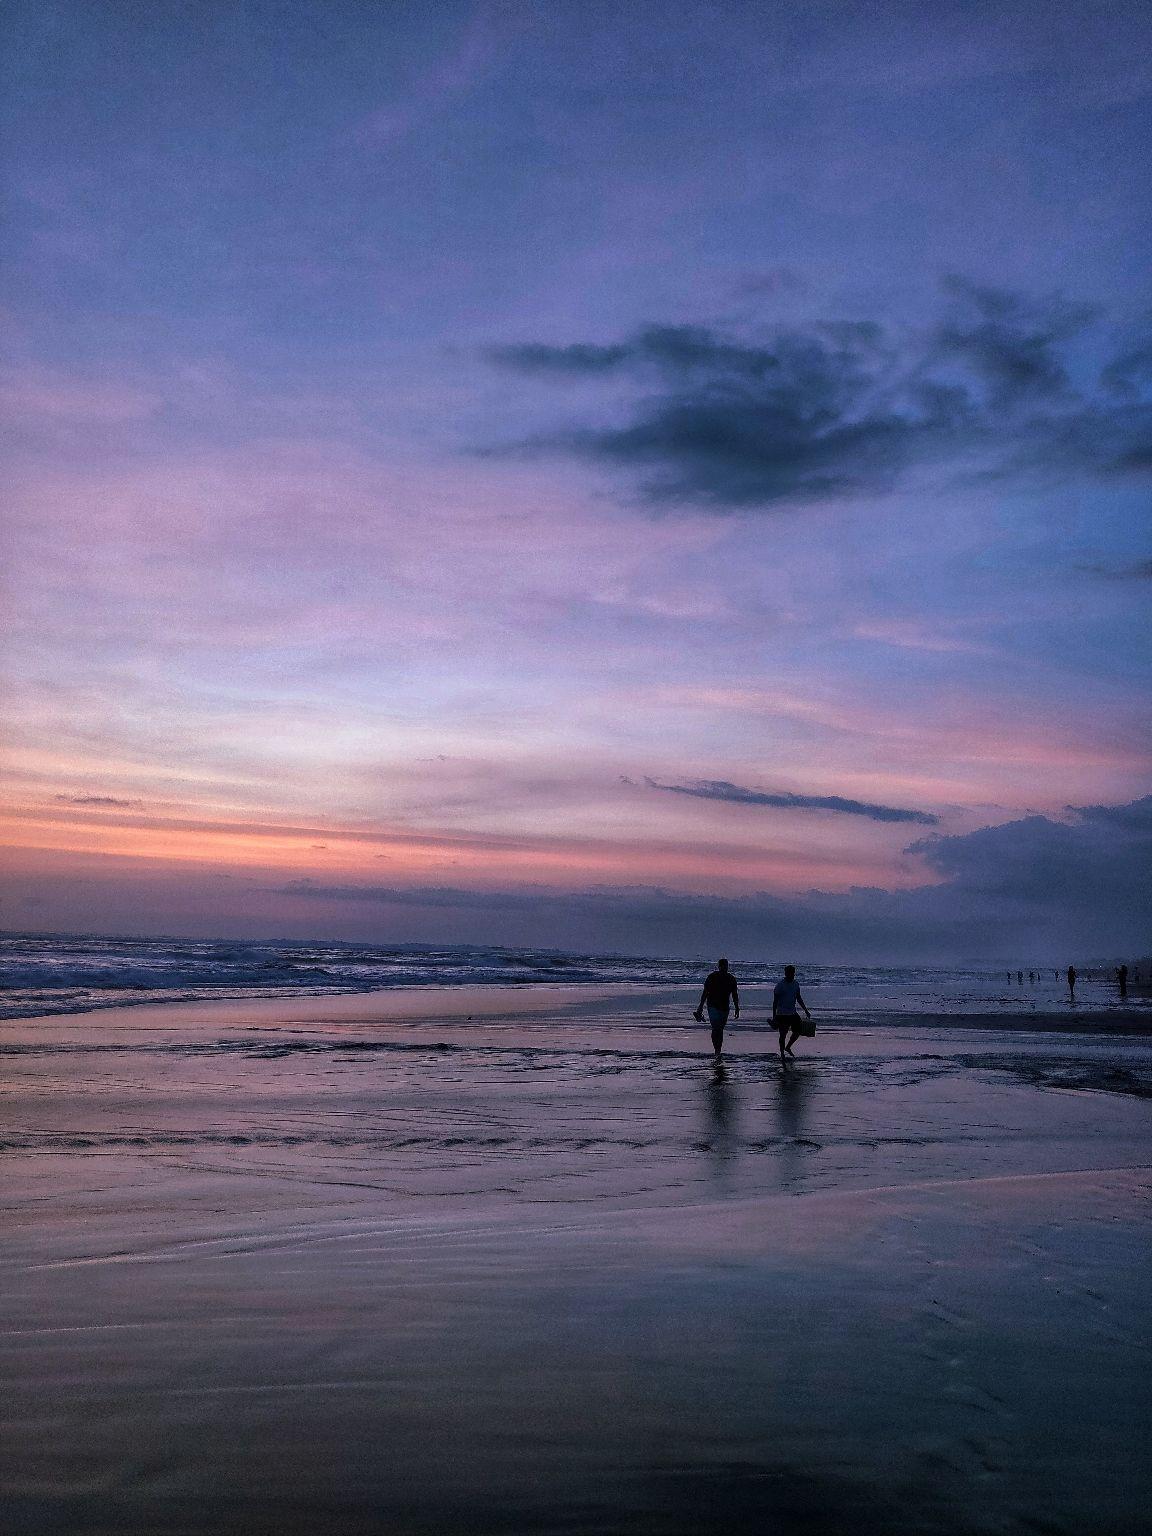 Photo of Bali By Nikhar Loonker